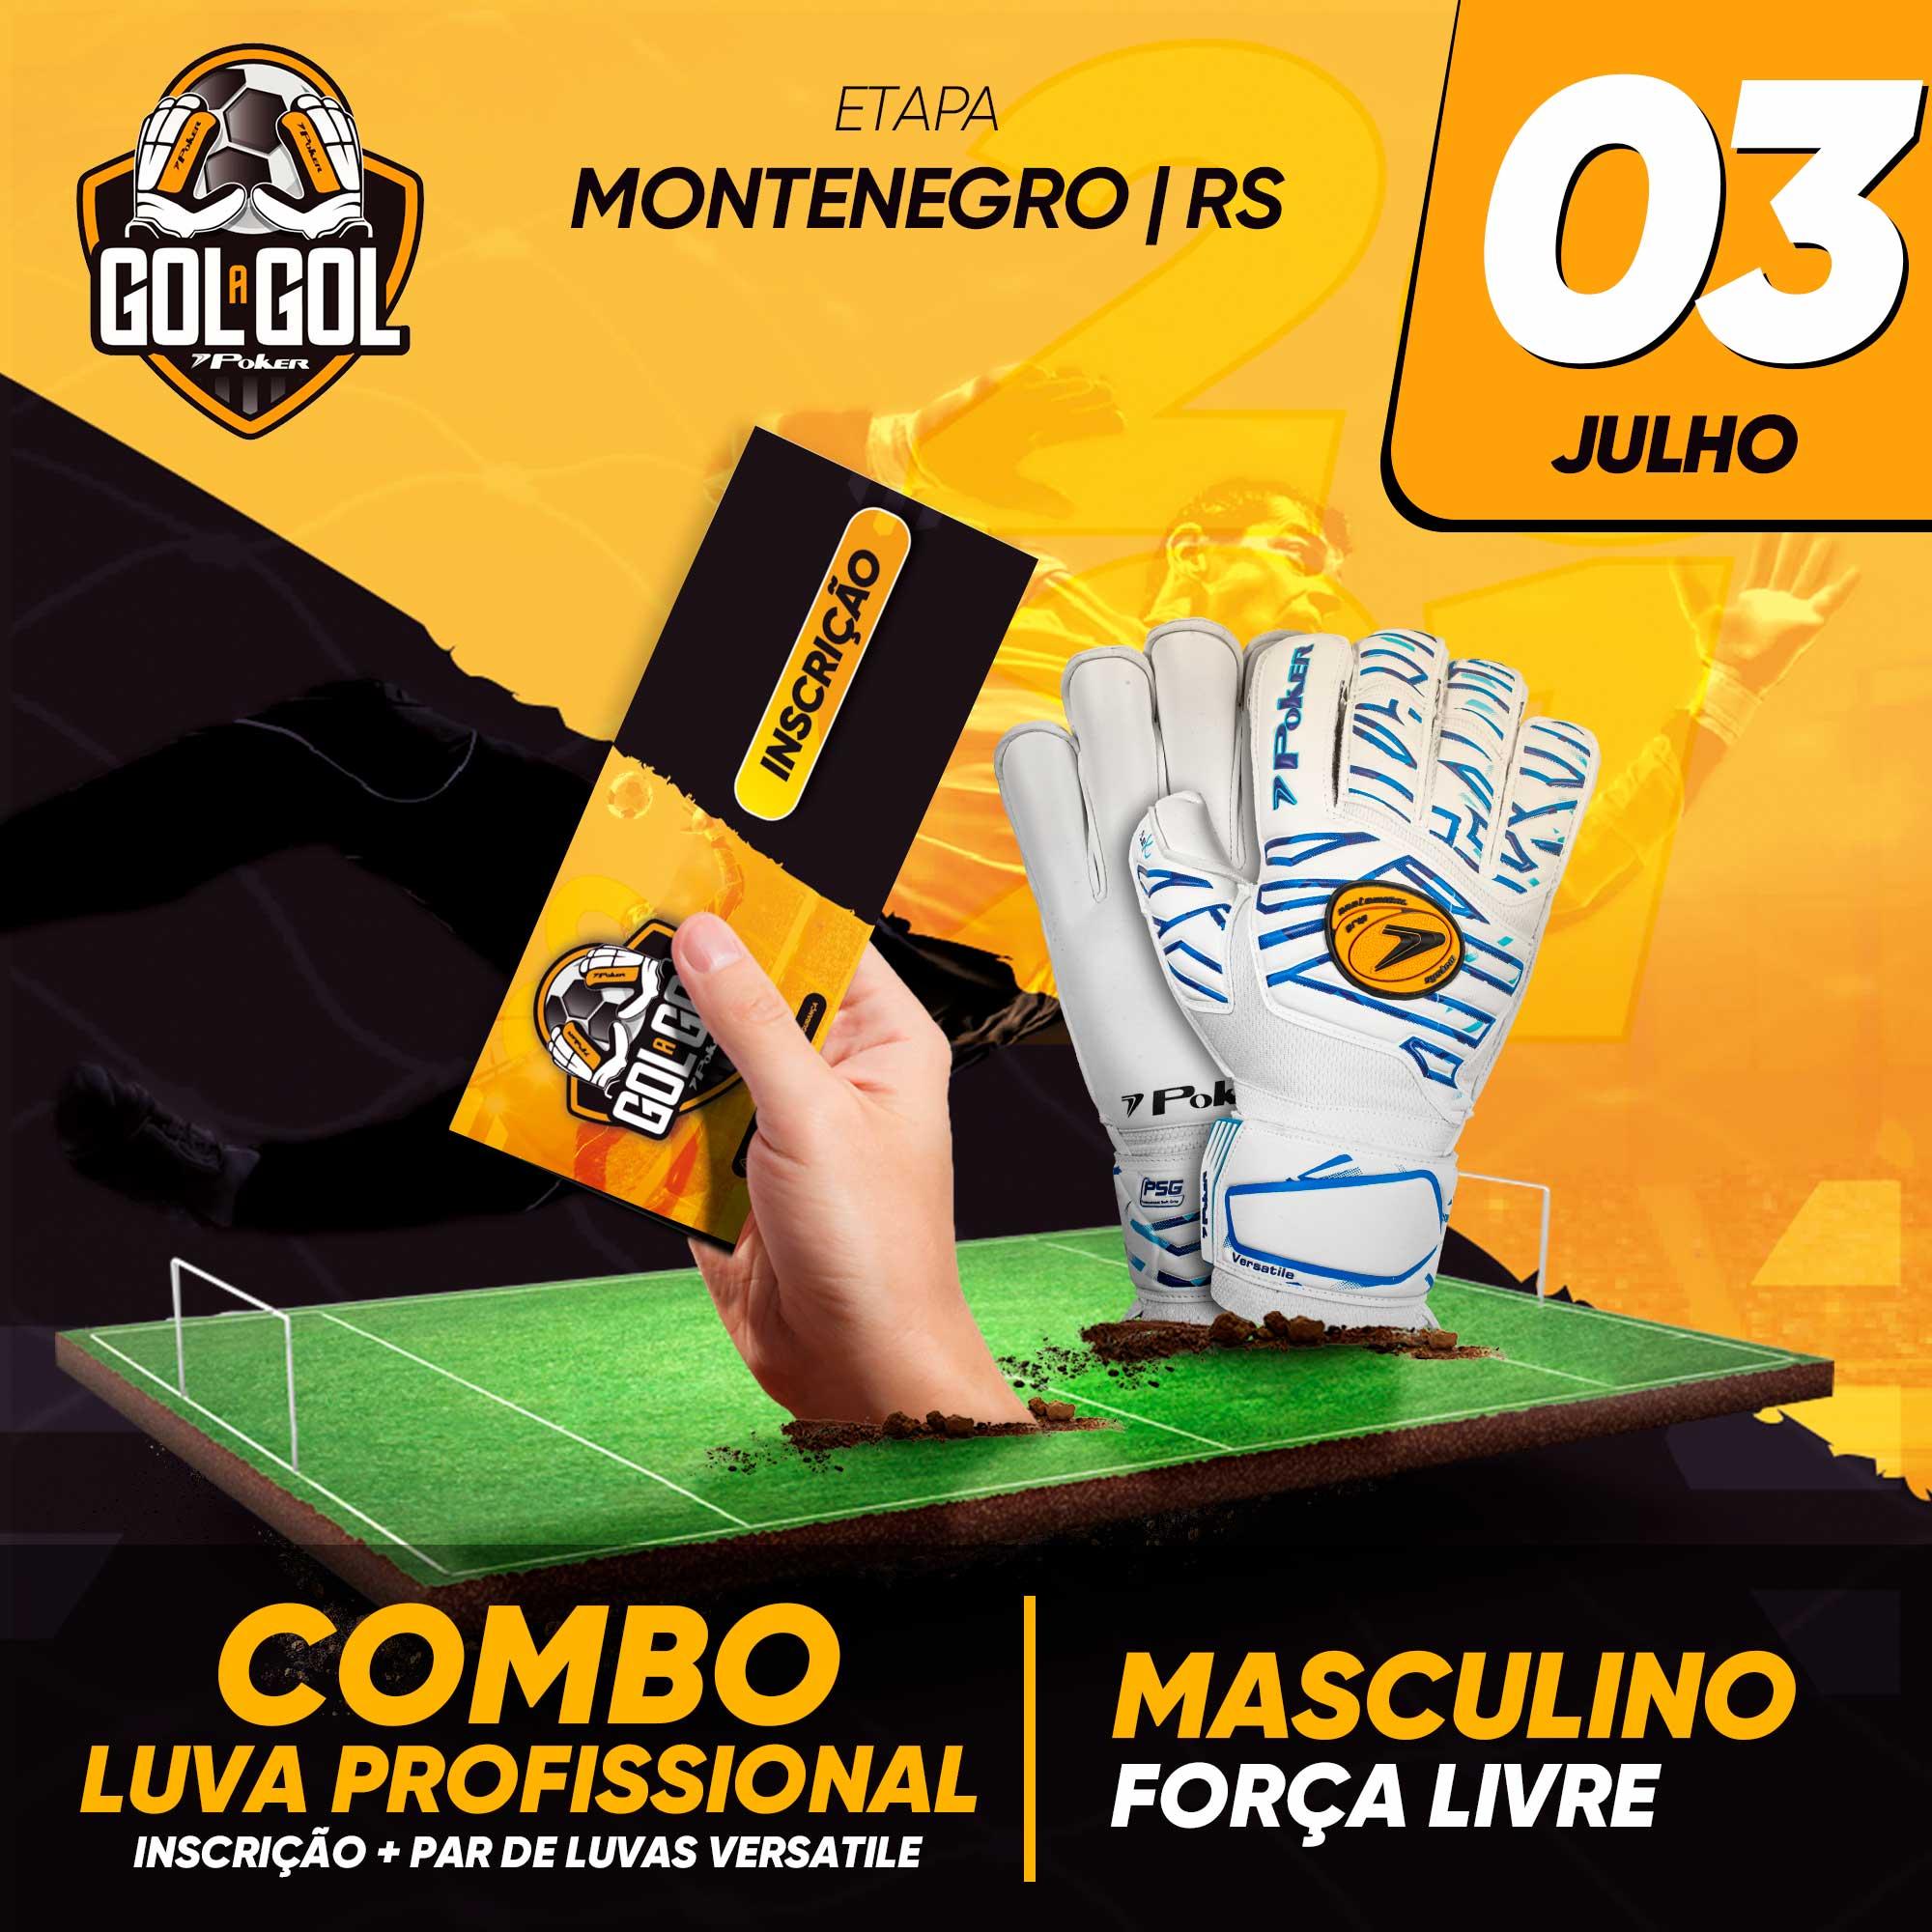 Combo Luva Profissional – Gol a Gol Montenegro – 03/07/2021